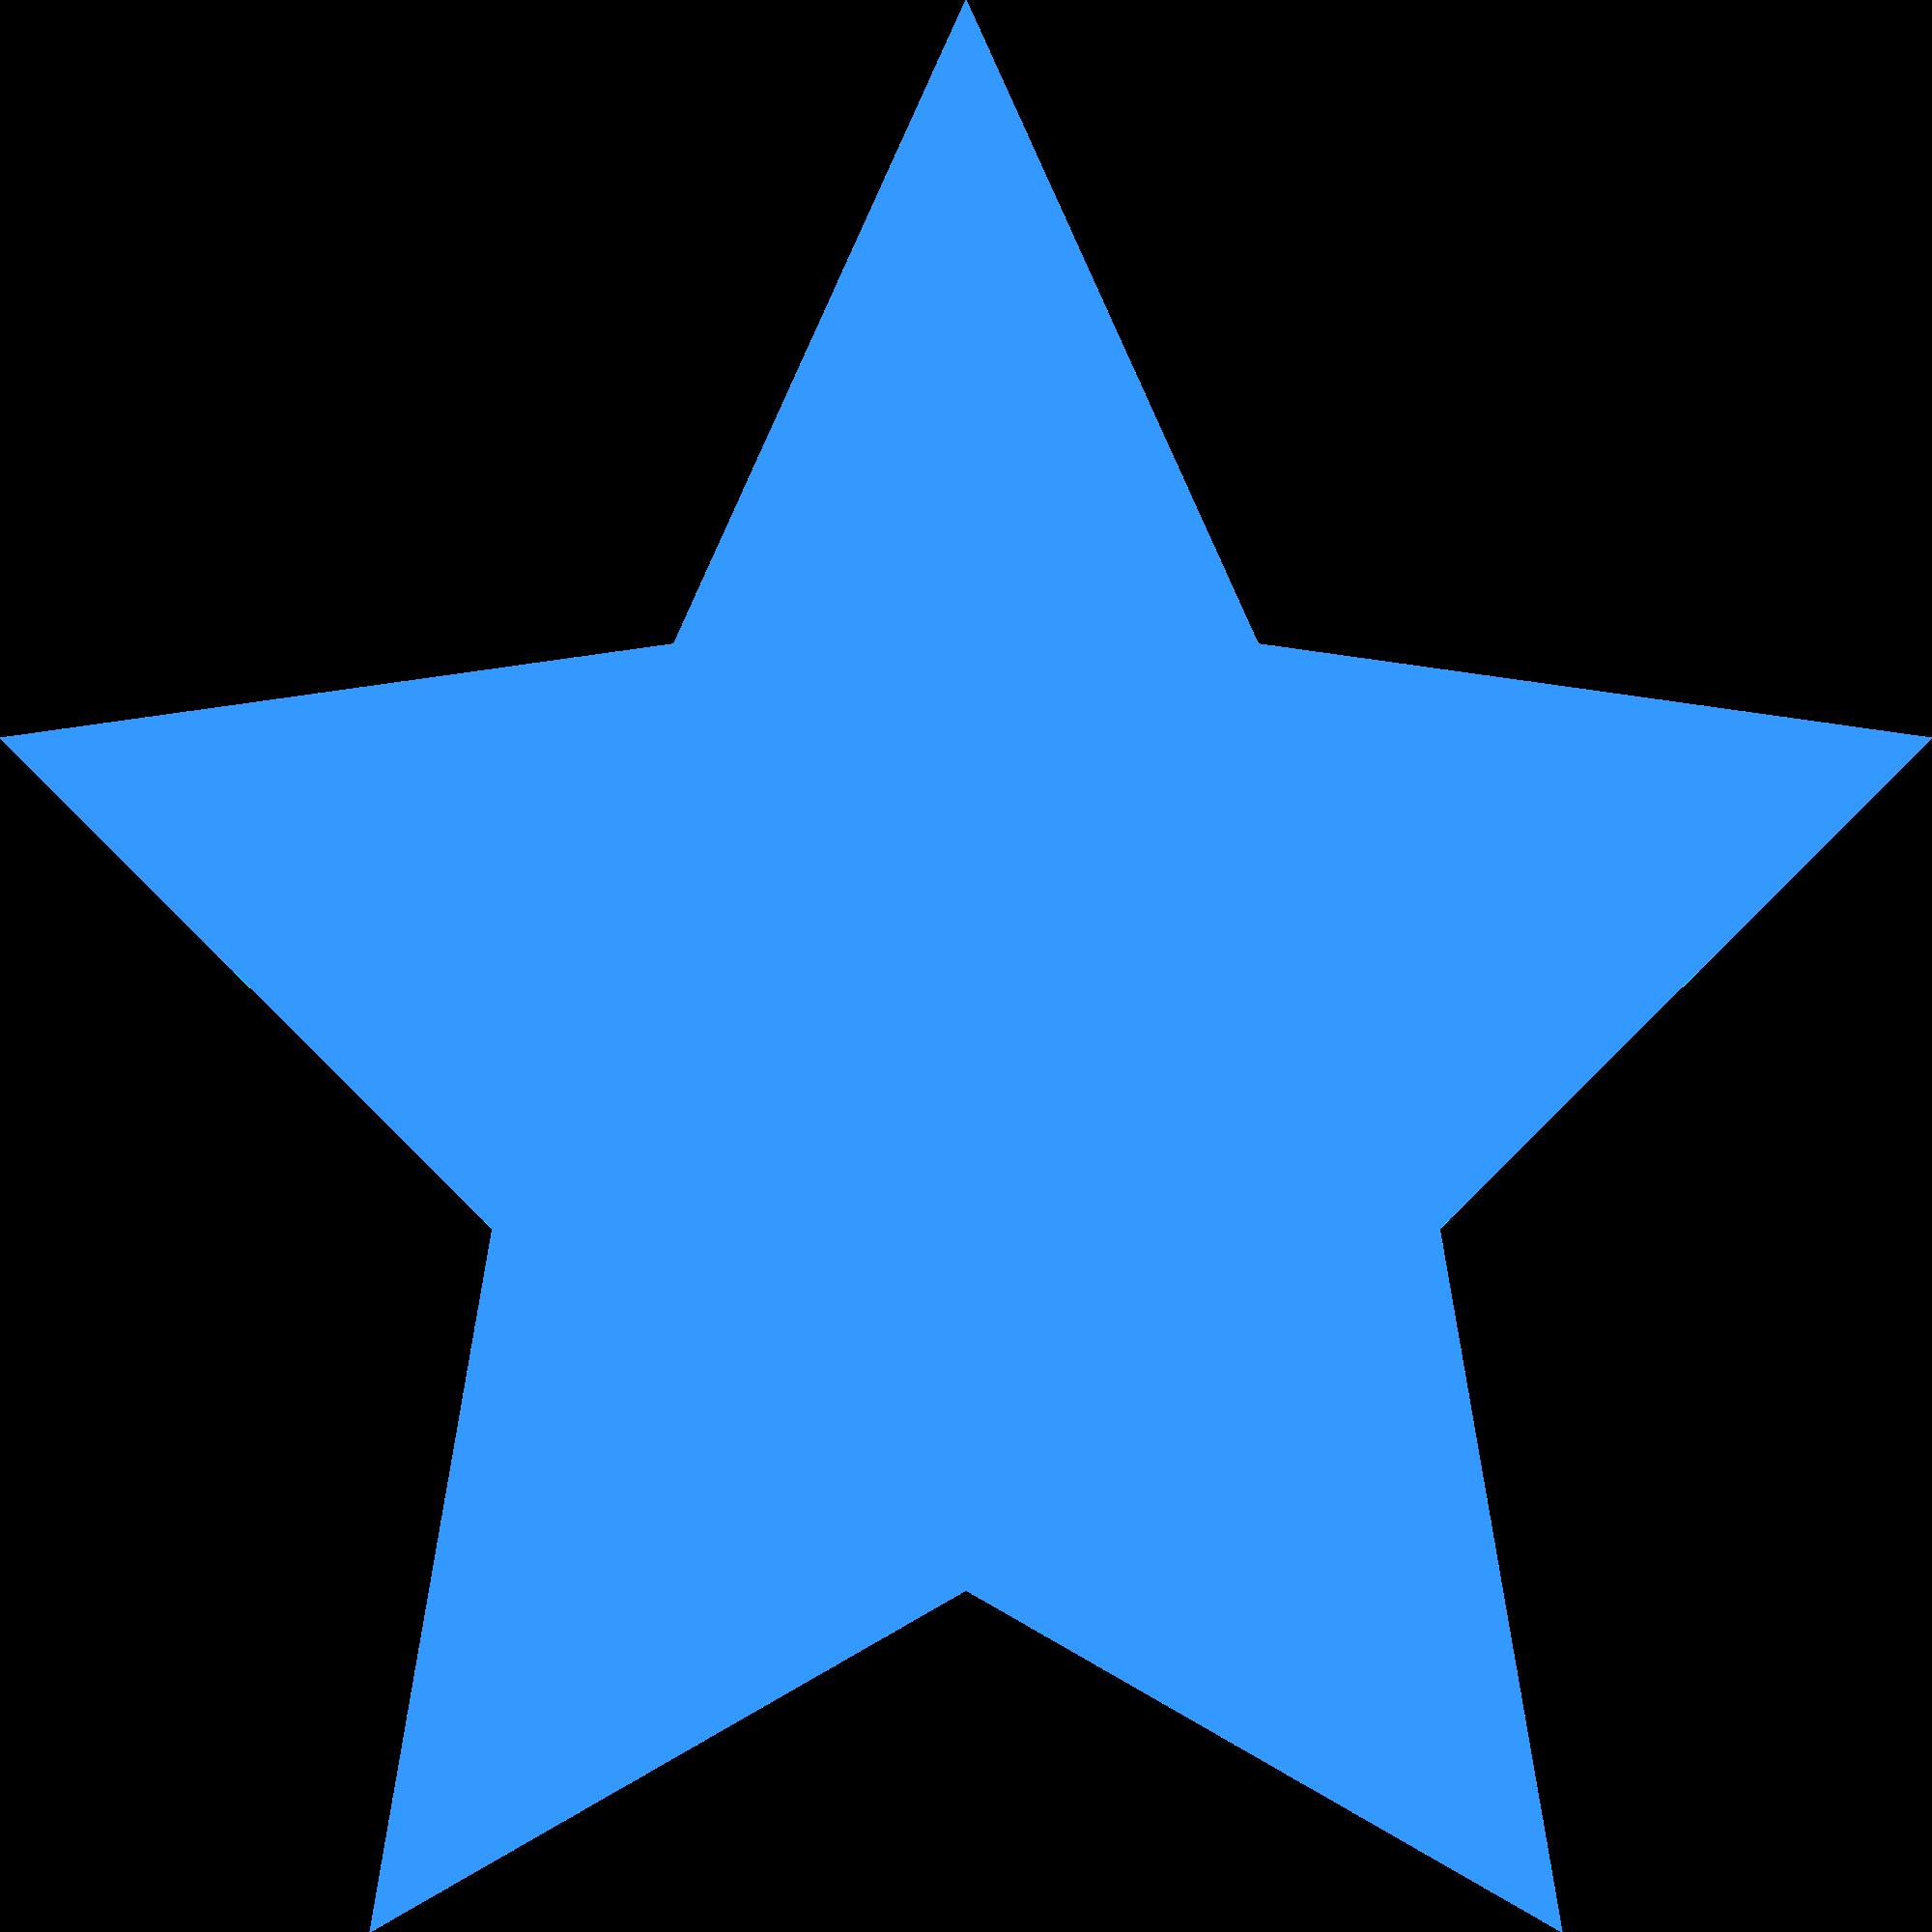 Star svg #13, Download drawings